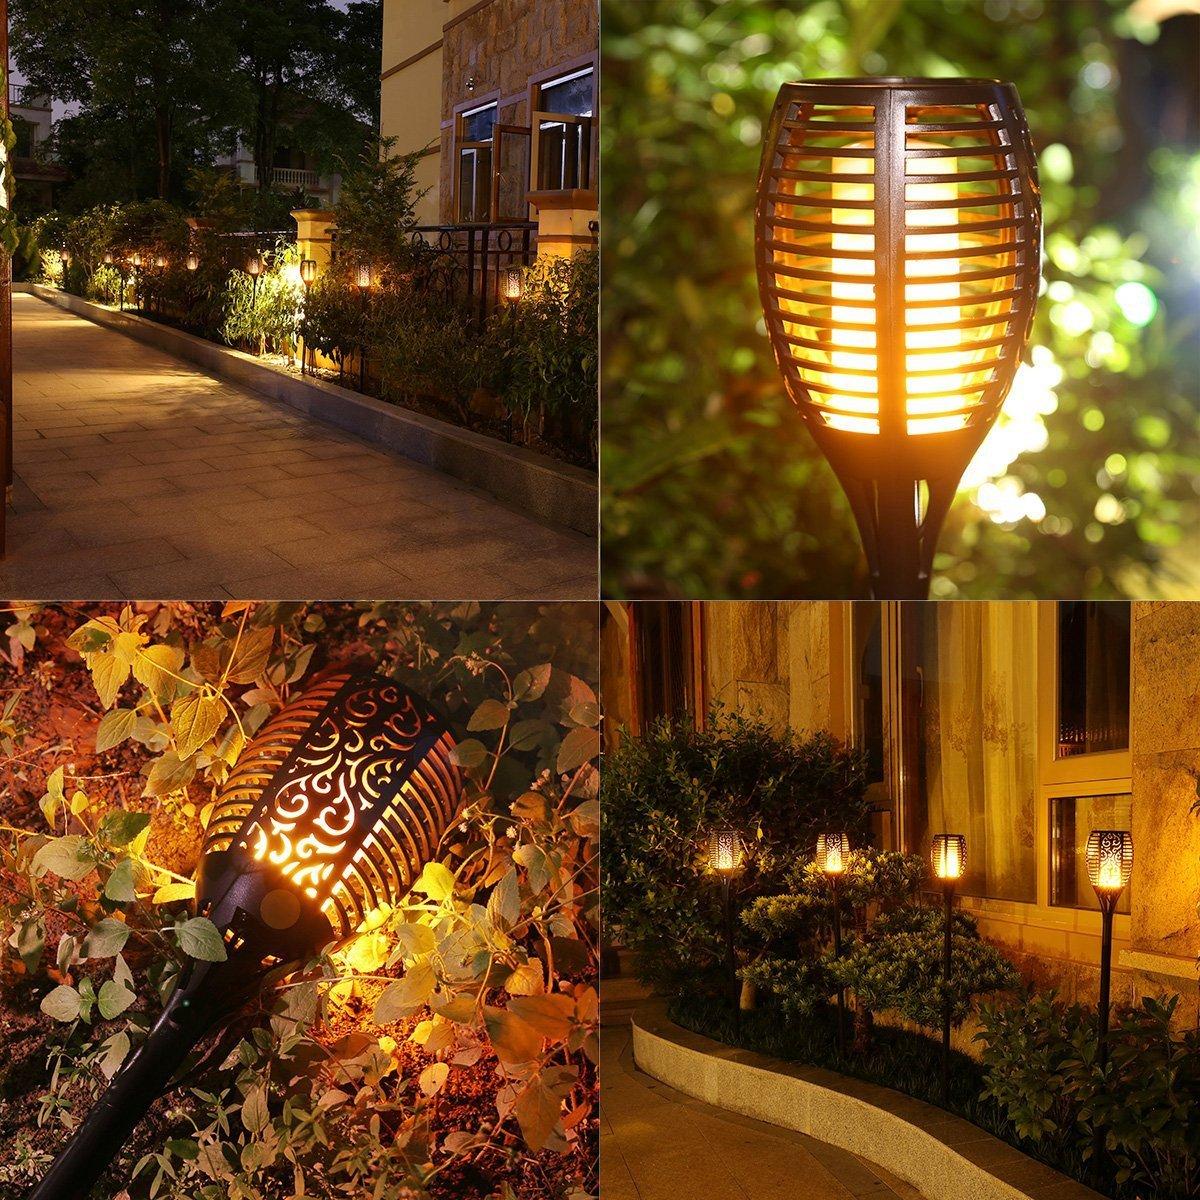 Nusun lite Solar Lights Dancing Flames Lights Solar Torch Lights Waterproof Wireless Flickering Torches Lantern Outdoor for Garden Patio Yard Driveway Pathway Pool (2 Pack) by Nusun lite (Image #4)